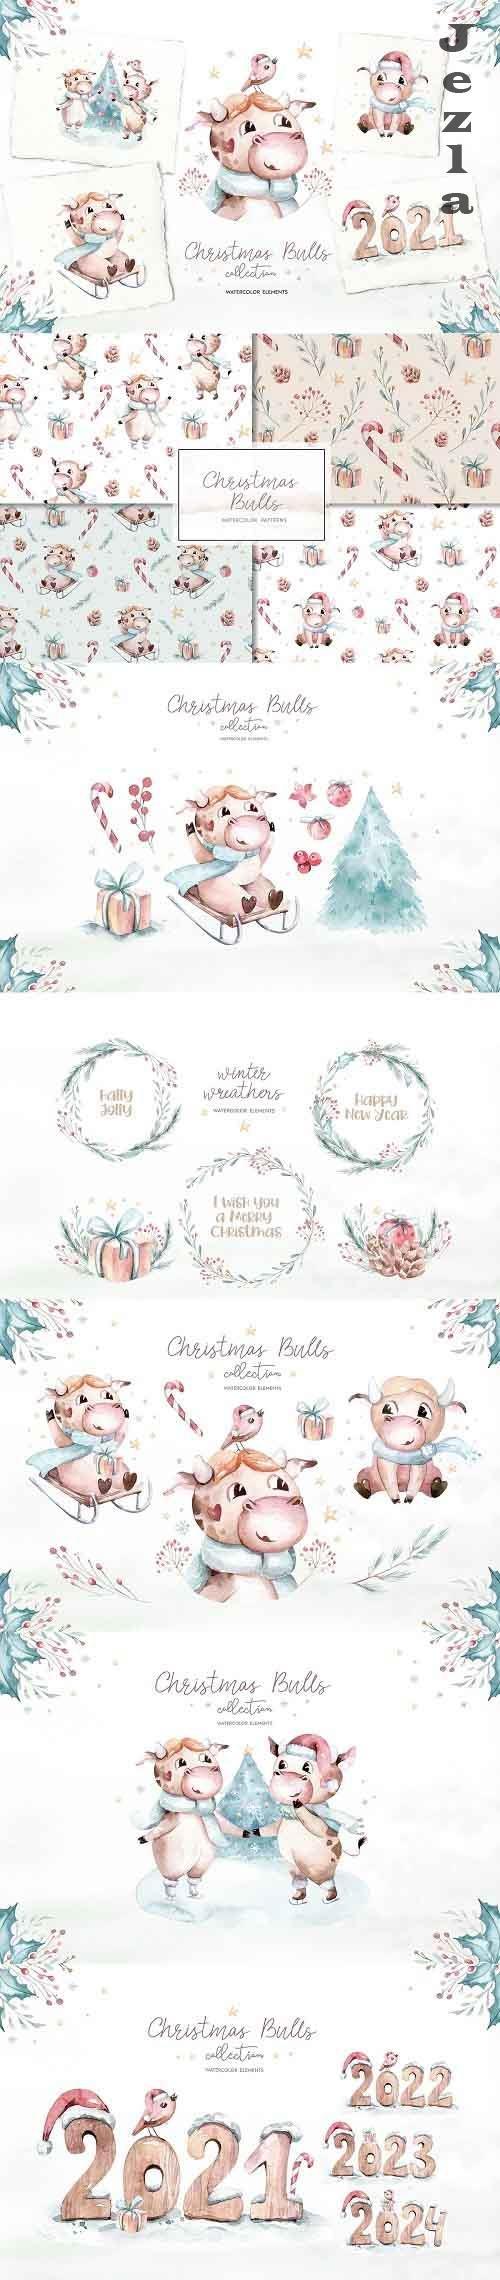 Christmas cute bulls collection! - 5503047